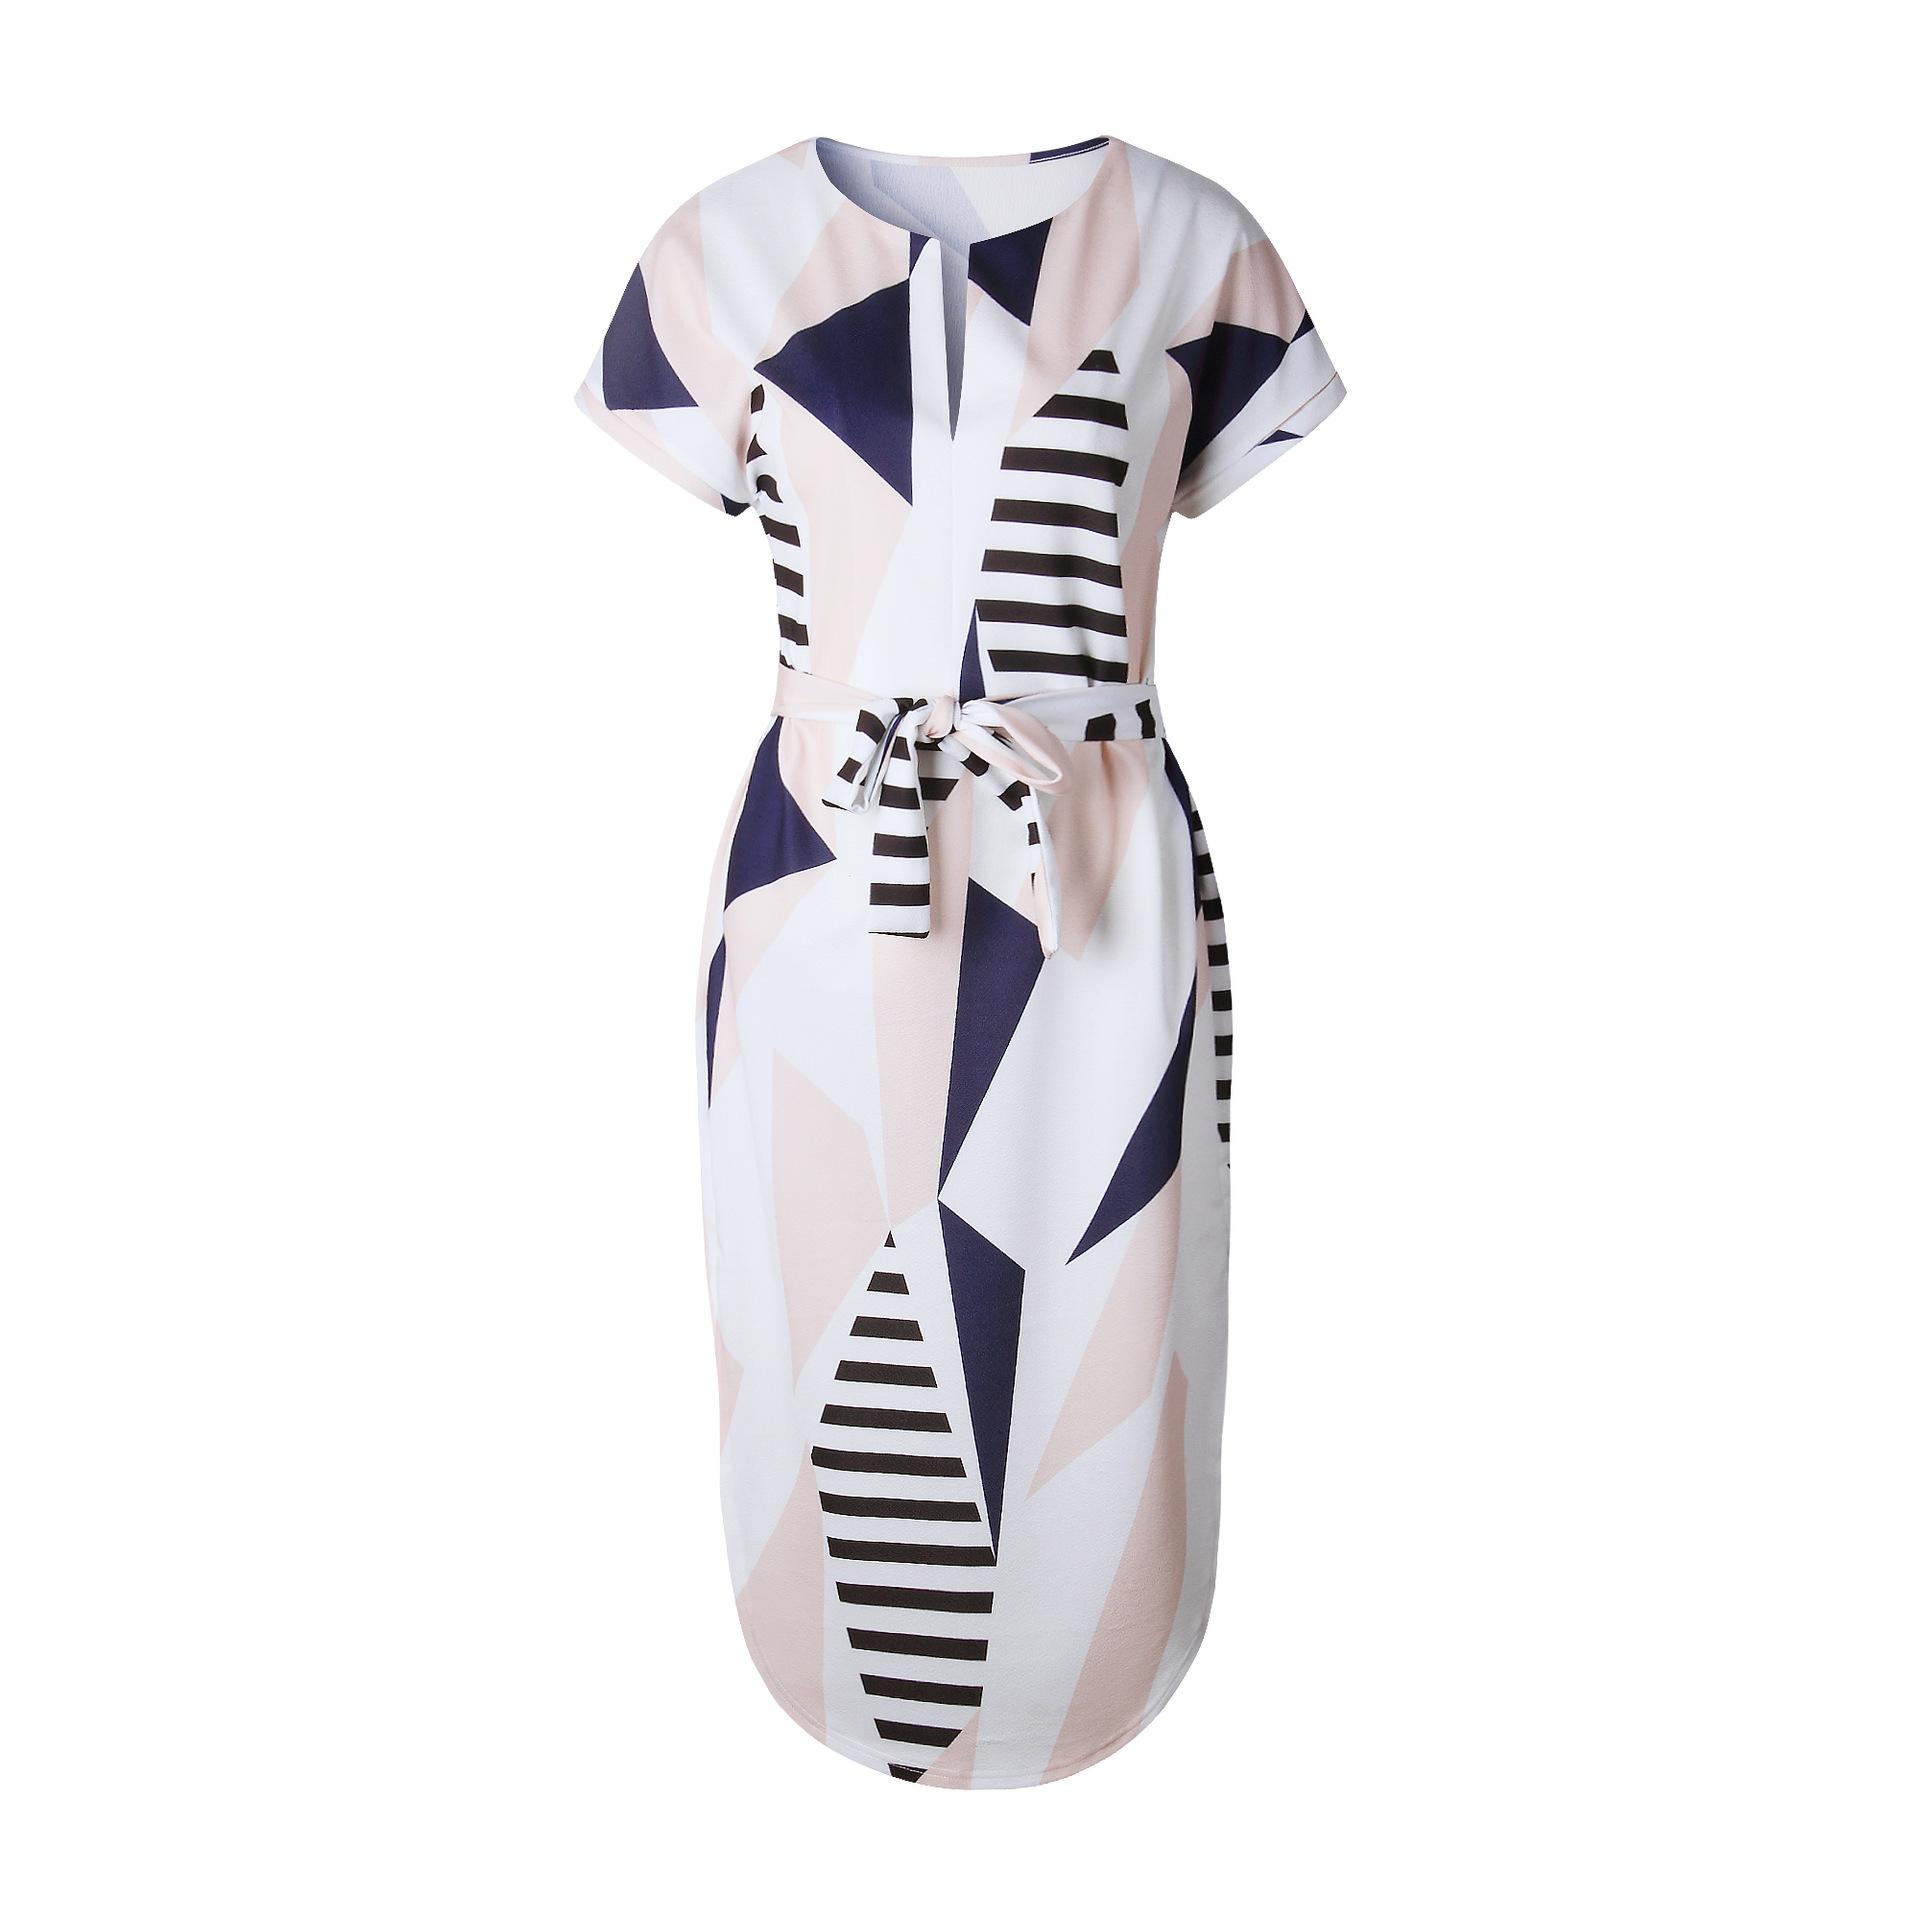 2018 Summer Dress Women Print V Neck Short Sleeve Robe Female Dresses Casual Sashes Midi Dress Ladies Elegant Vestidos Dropship 8